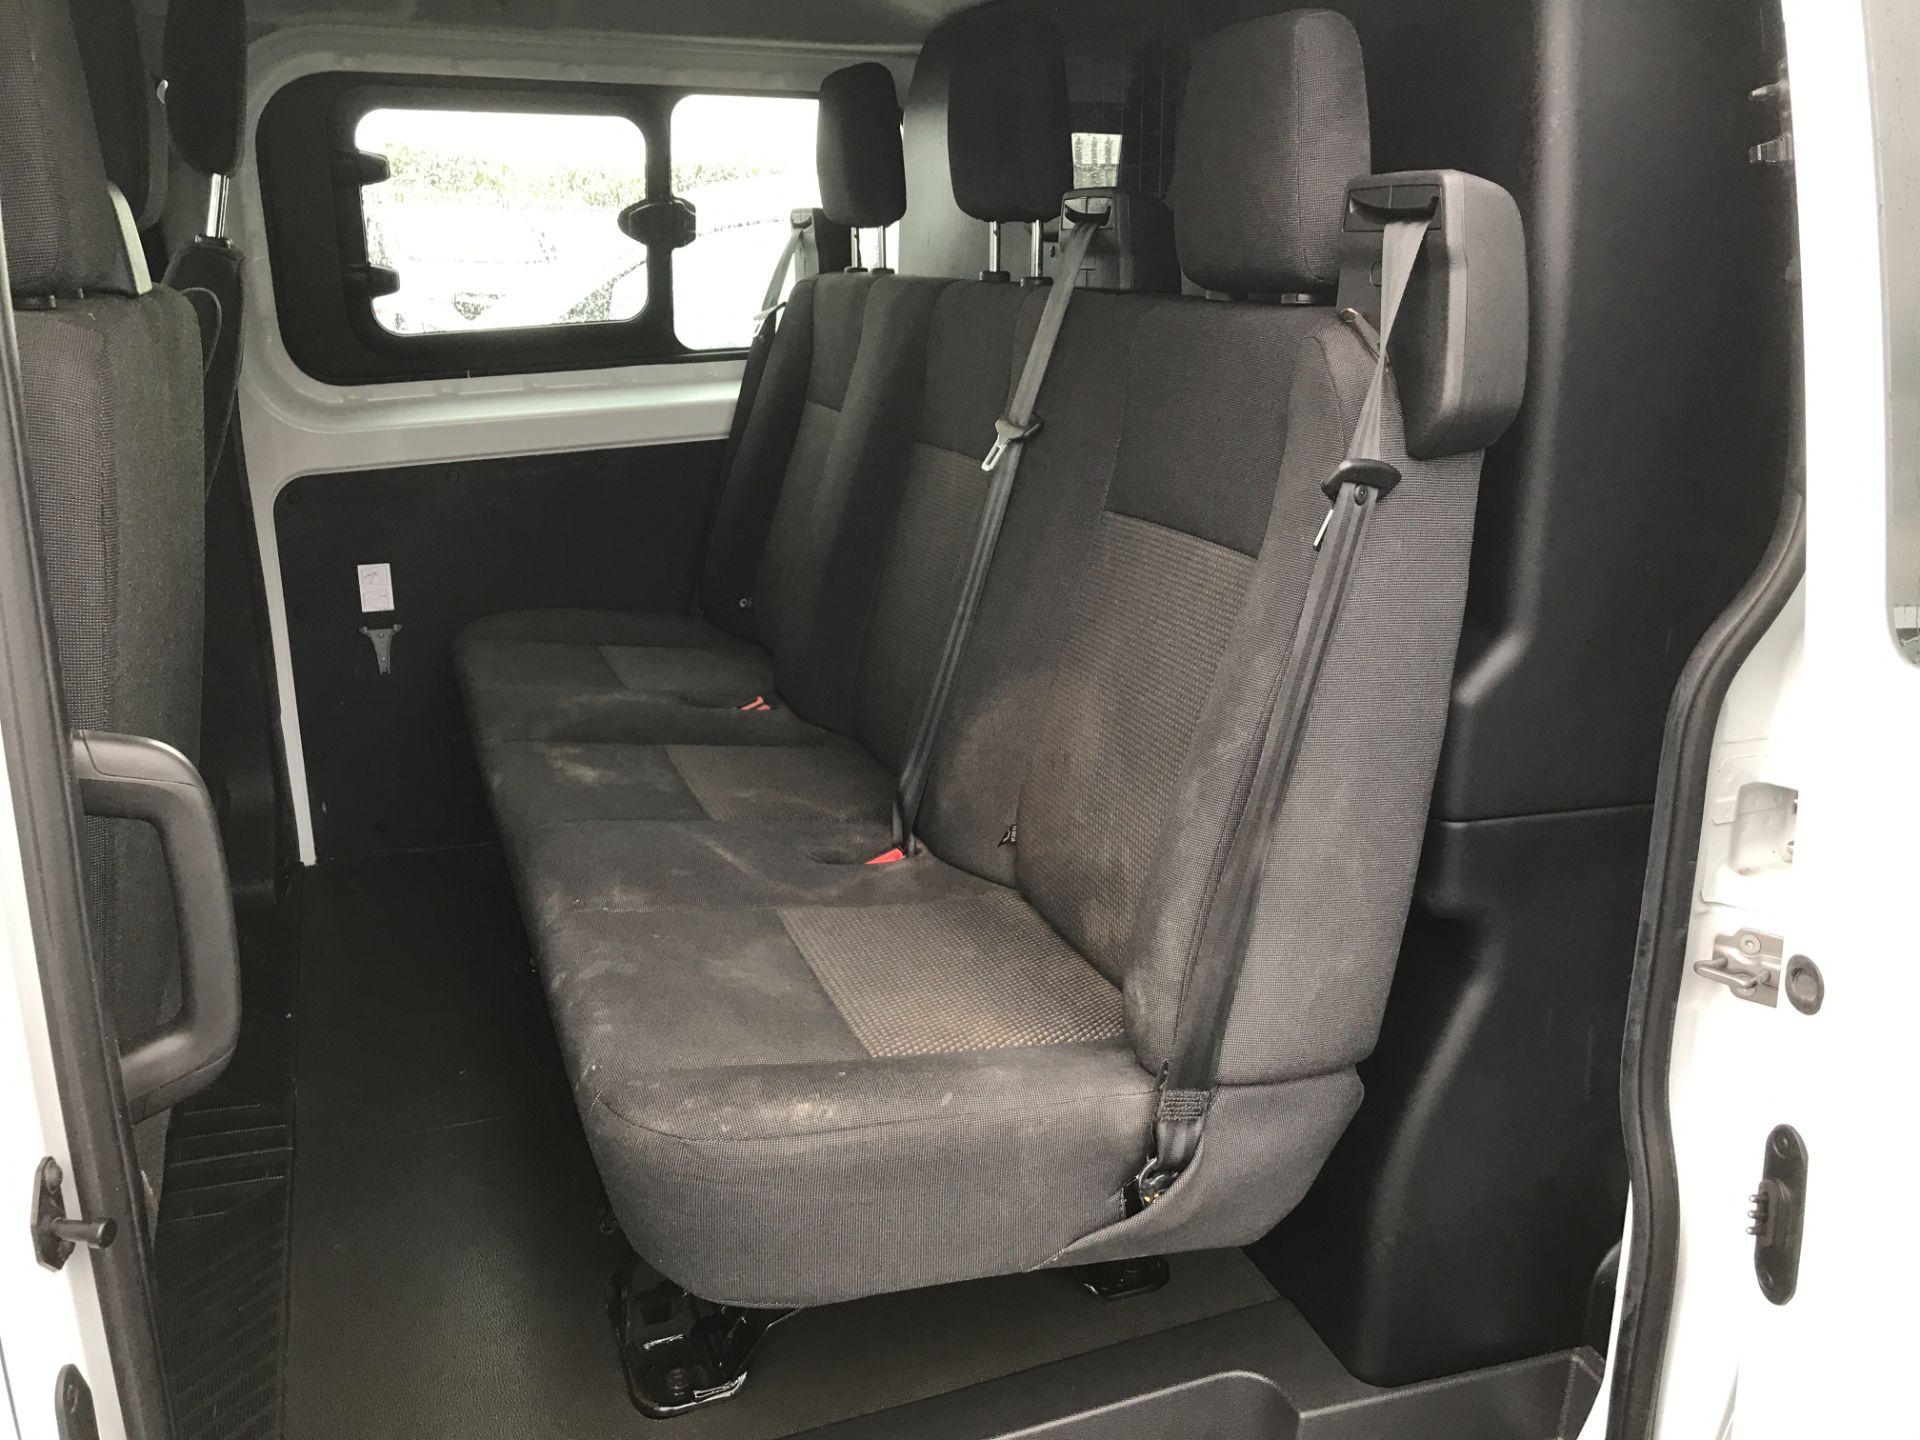 2017 Ford Transit Custom 290 L1 2.0TDCI 105PS LOW ROOF EURO 6 DOUBLE CAB (FE17VJX) Image 7